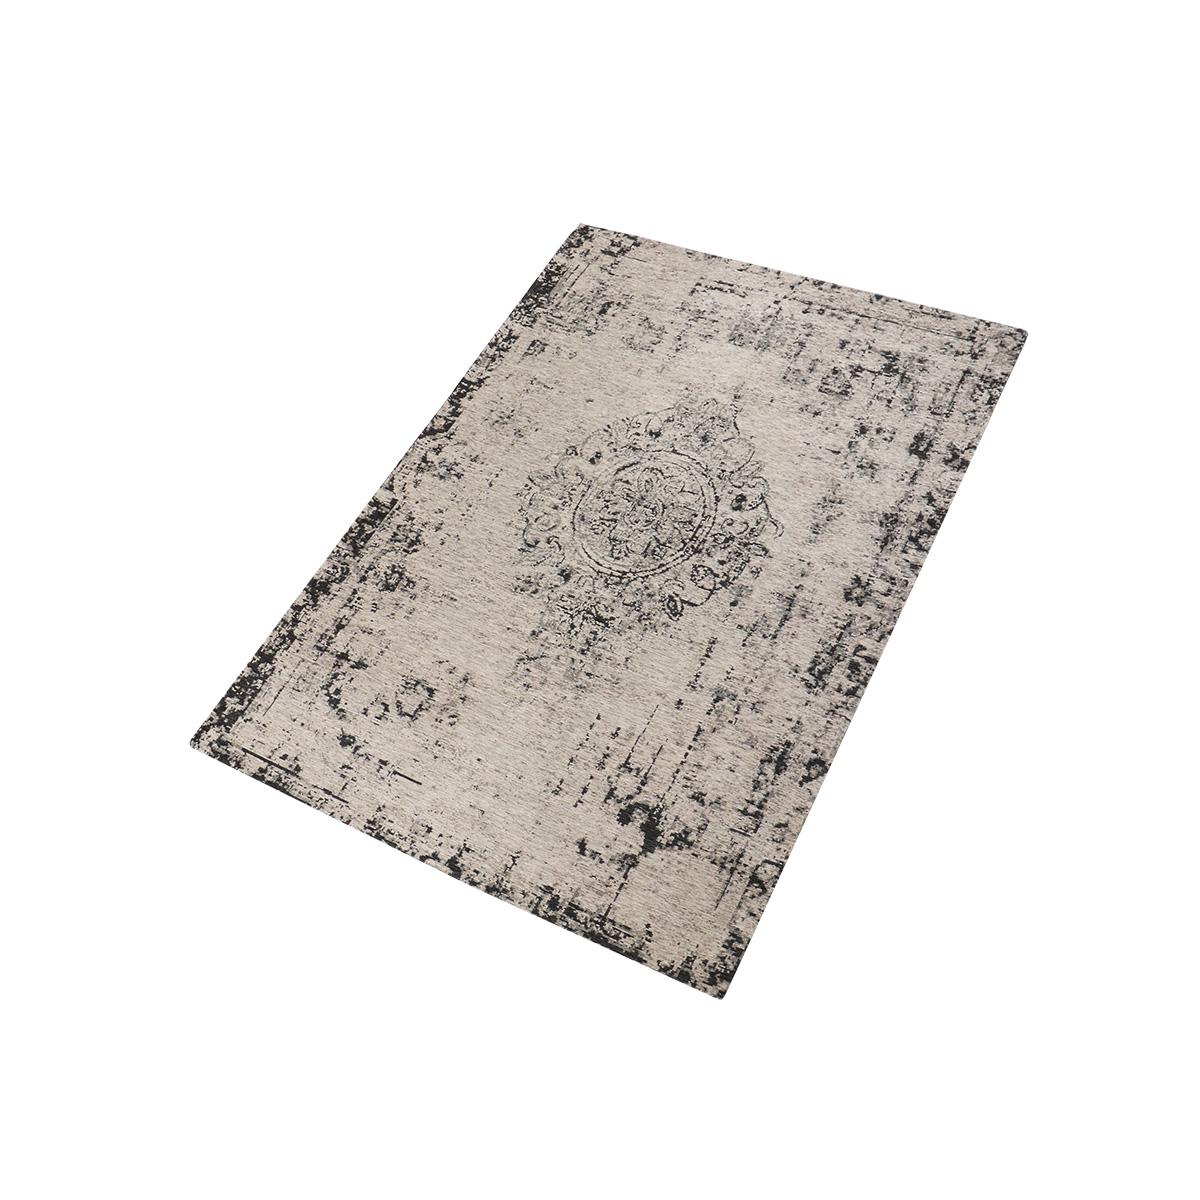 Flachgewebe Teppich Antika Ornament